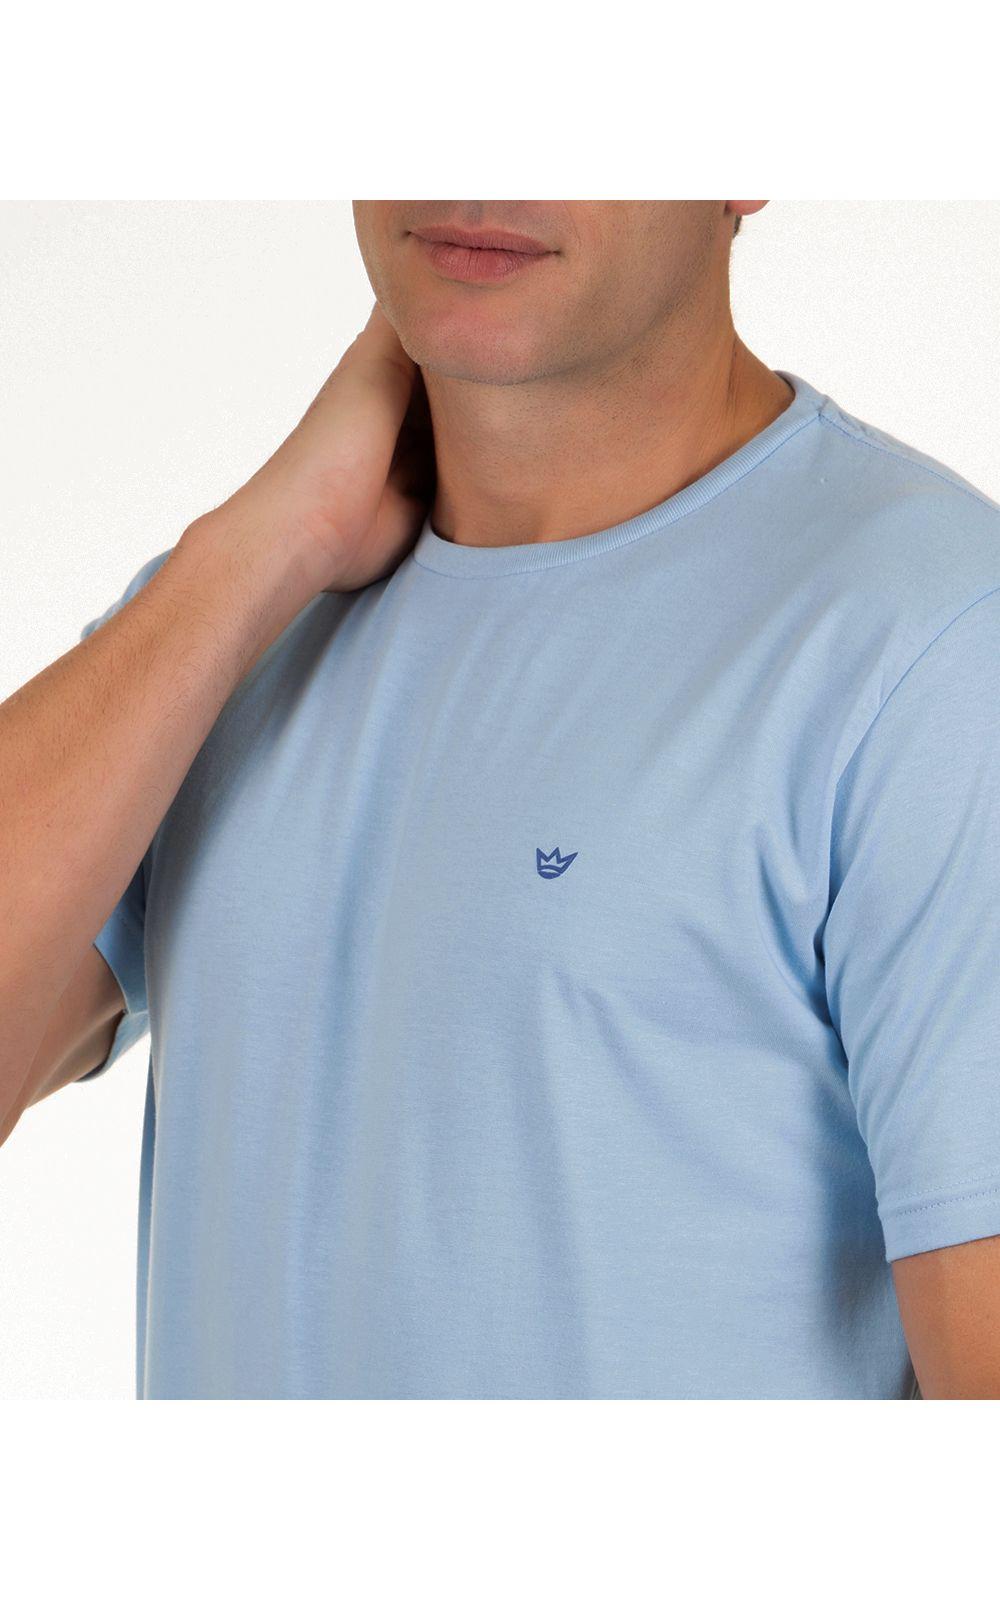 Foto 3 - Camiseta Masculina Azul Claro Lisa